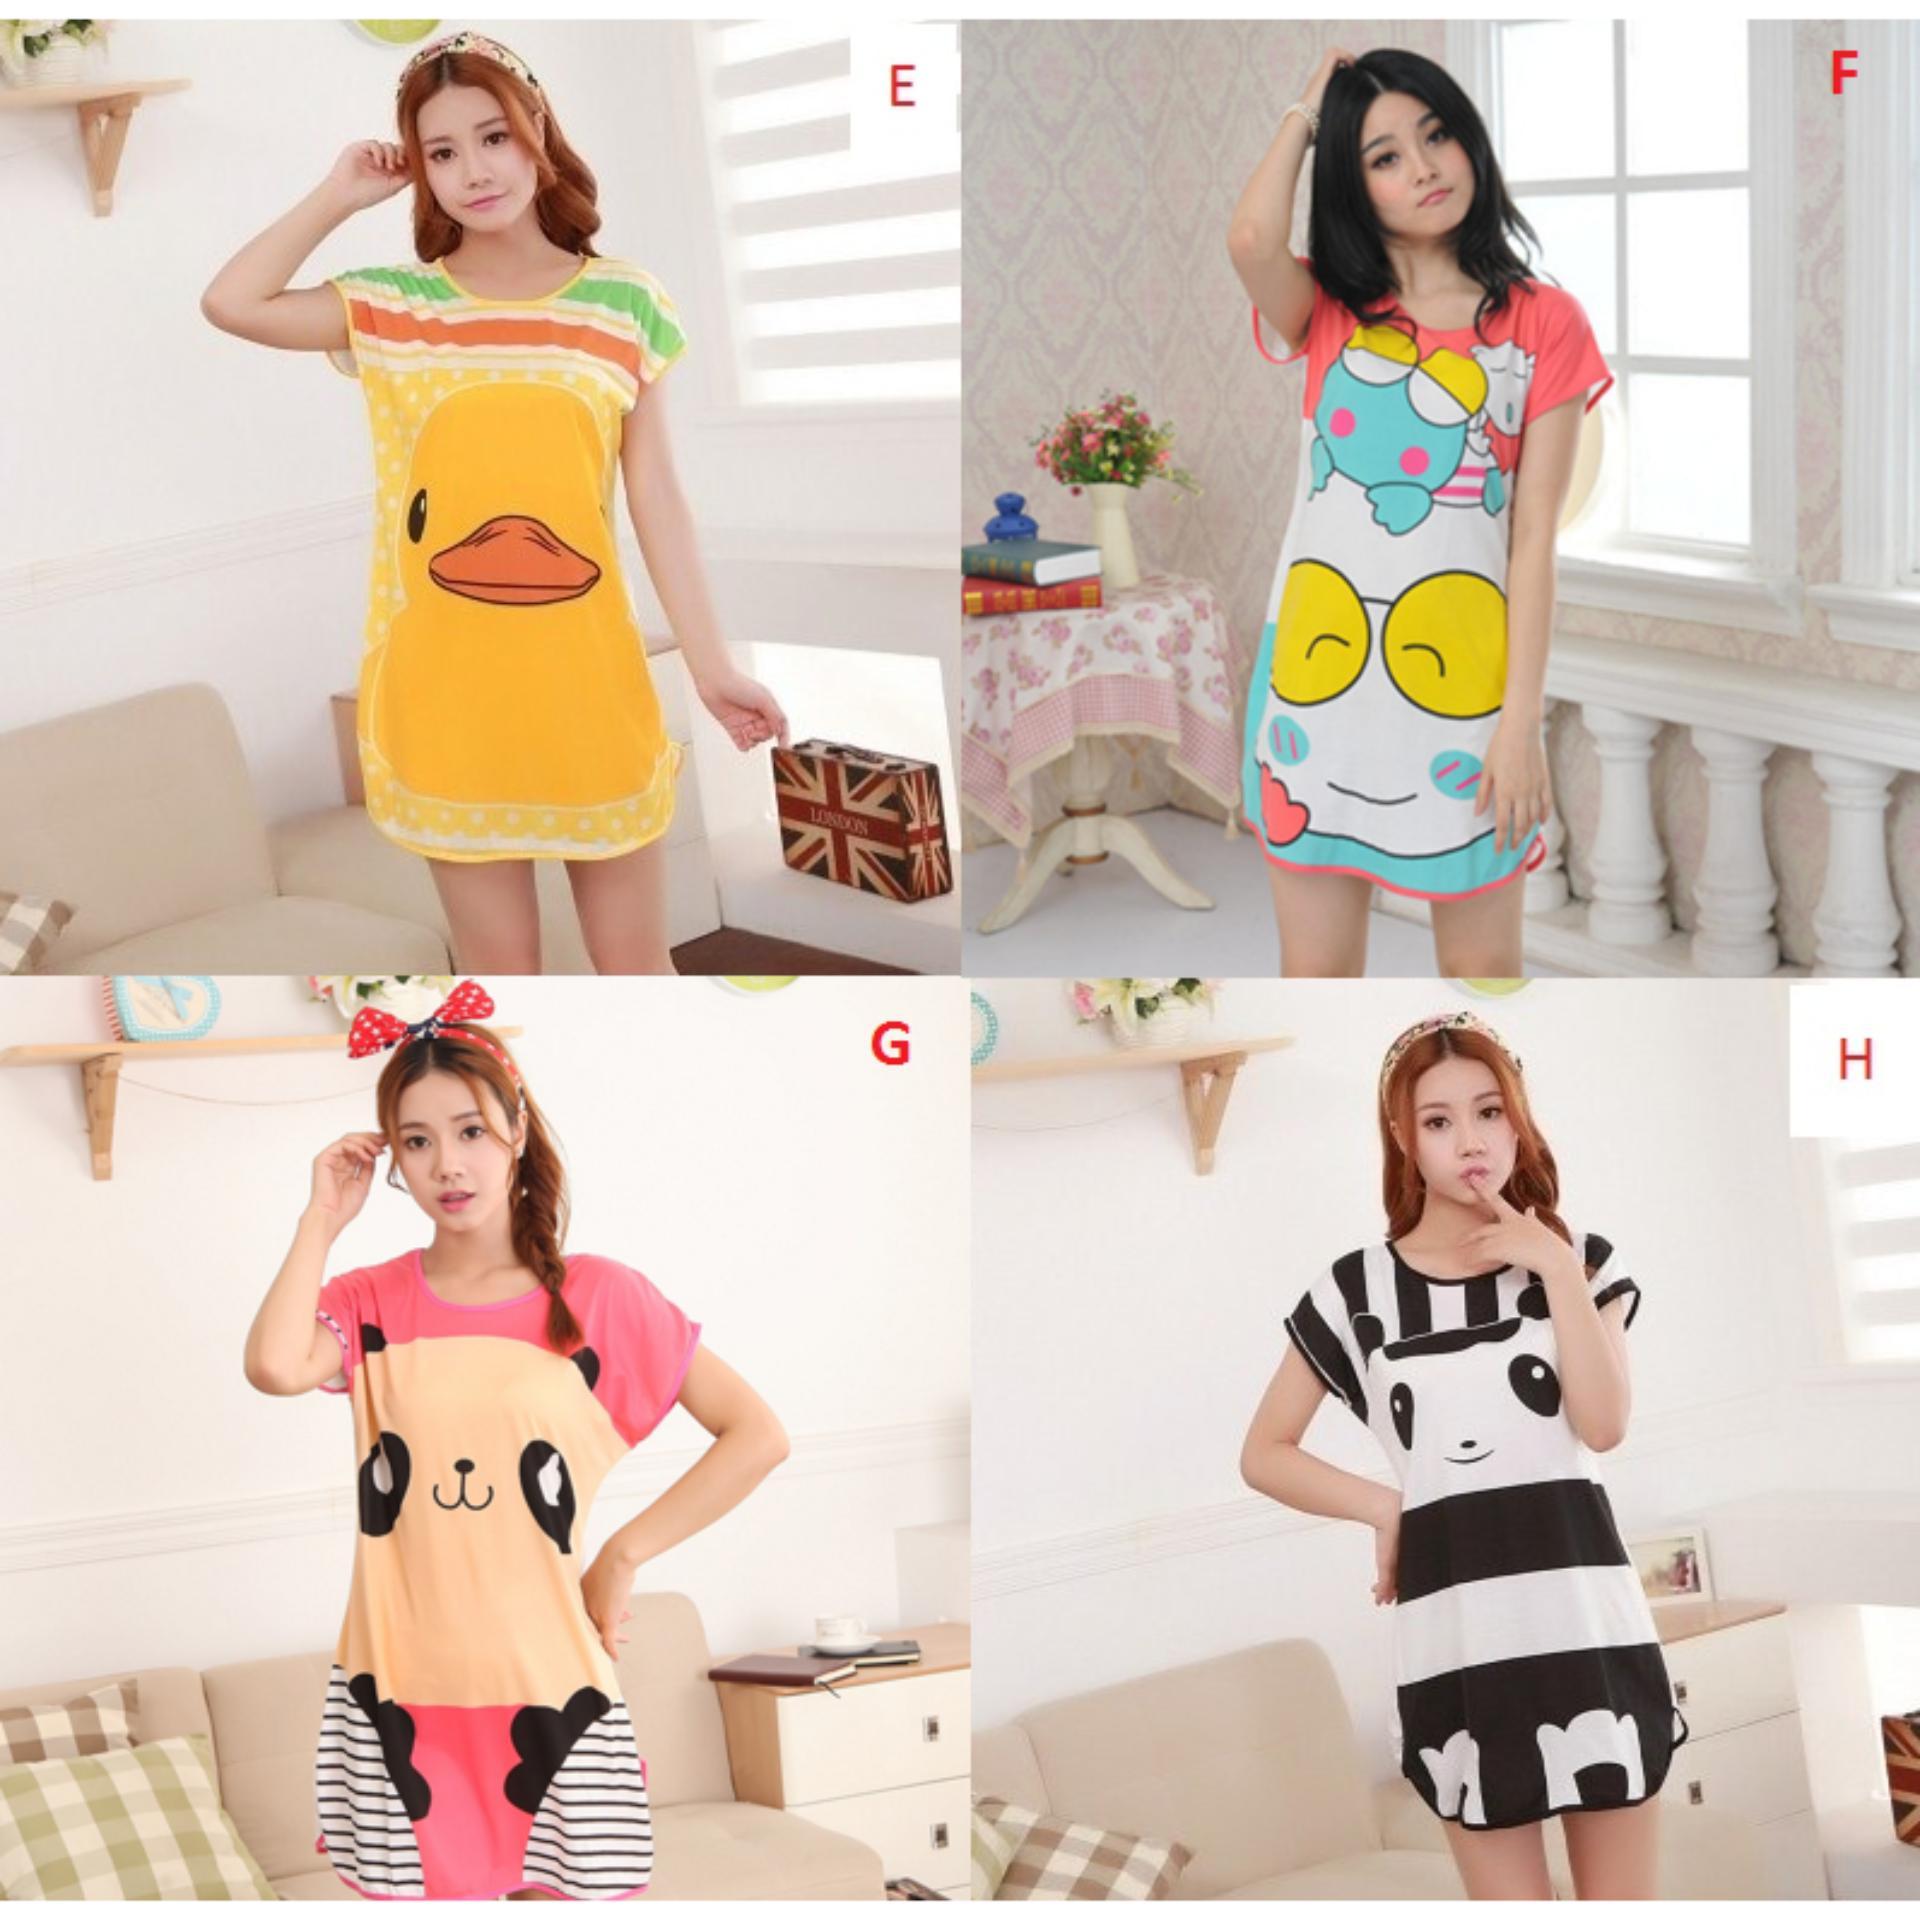 Kehebatan Baju Tidur Satin Piyama Murah Bajutidur Silk Import Pria Korean Style Cewek Motif Daster 5